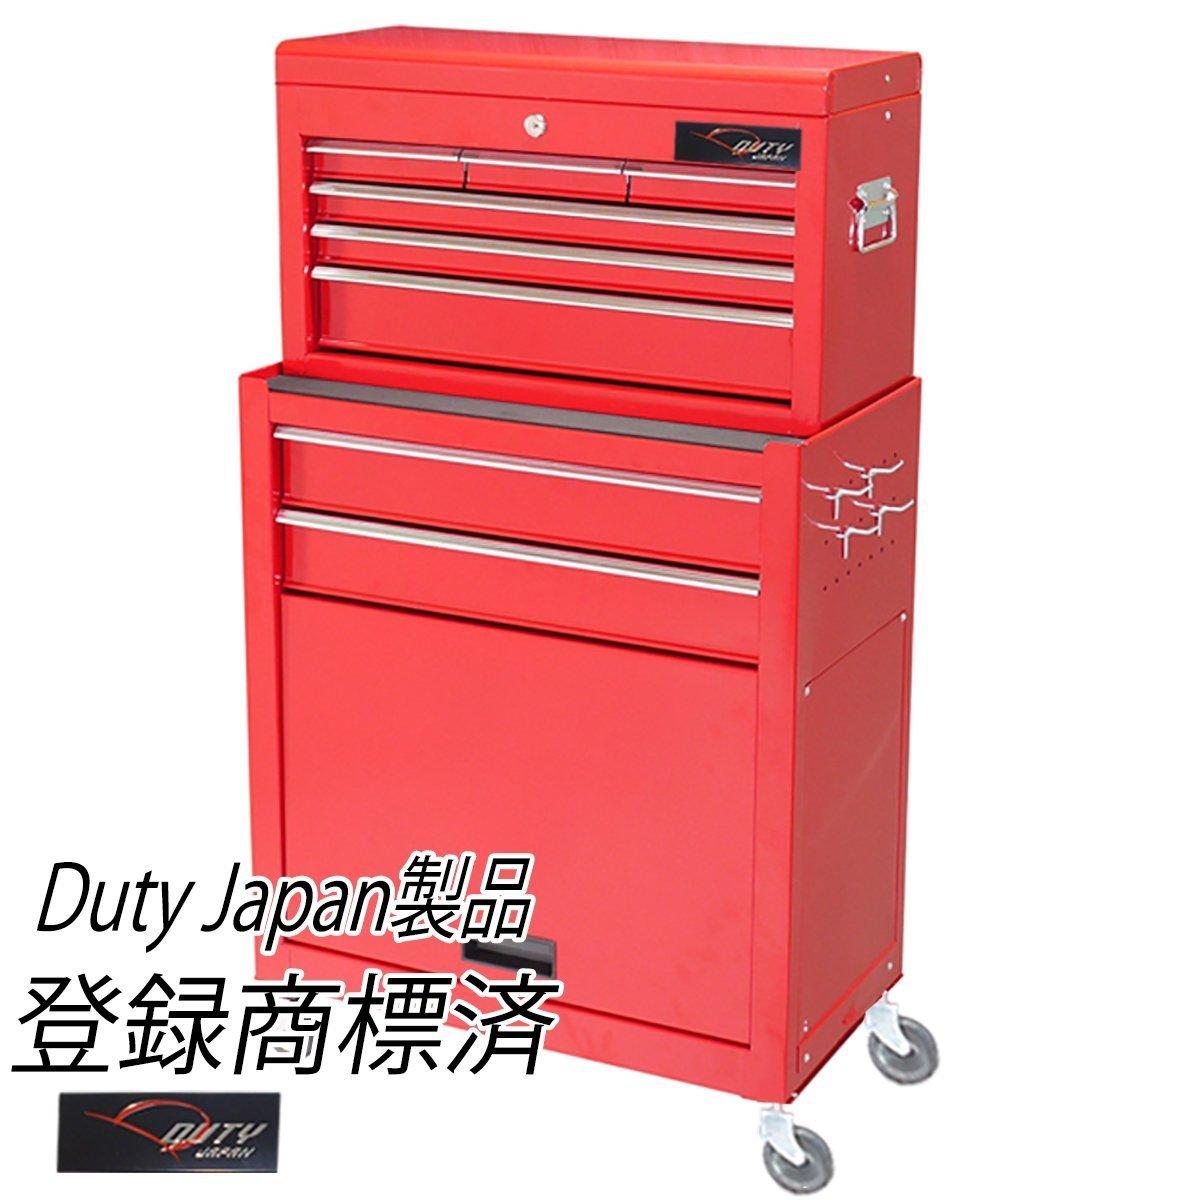 【Duty Japan®】コンパクト収納型チェスト&キャビネット (レッド)